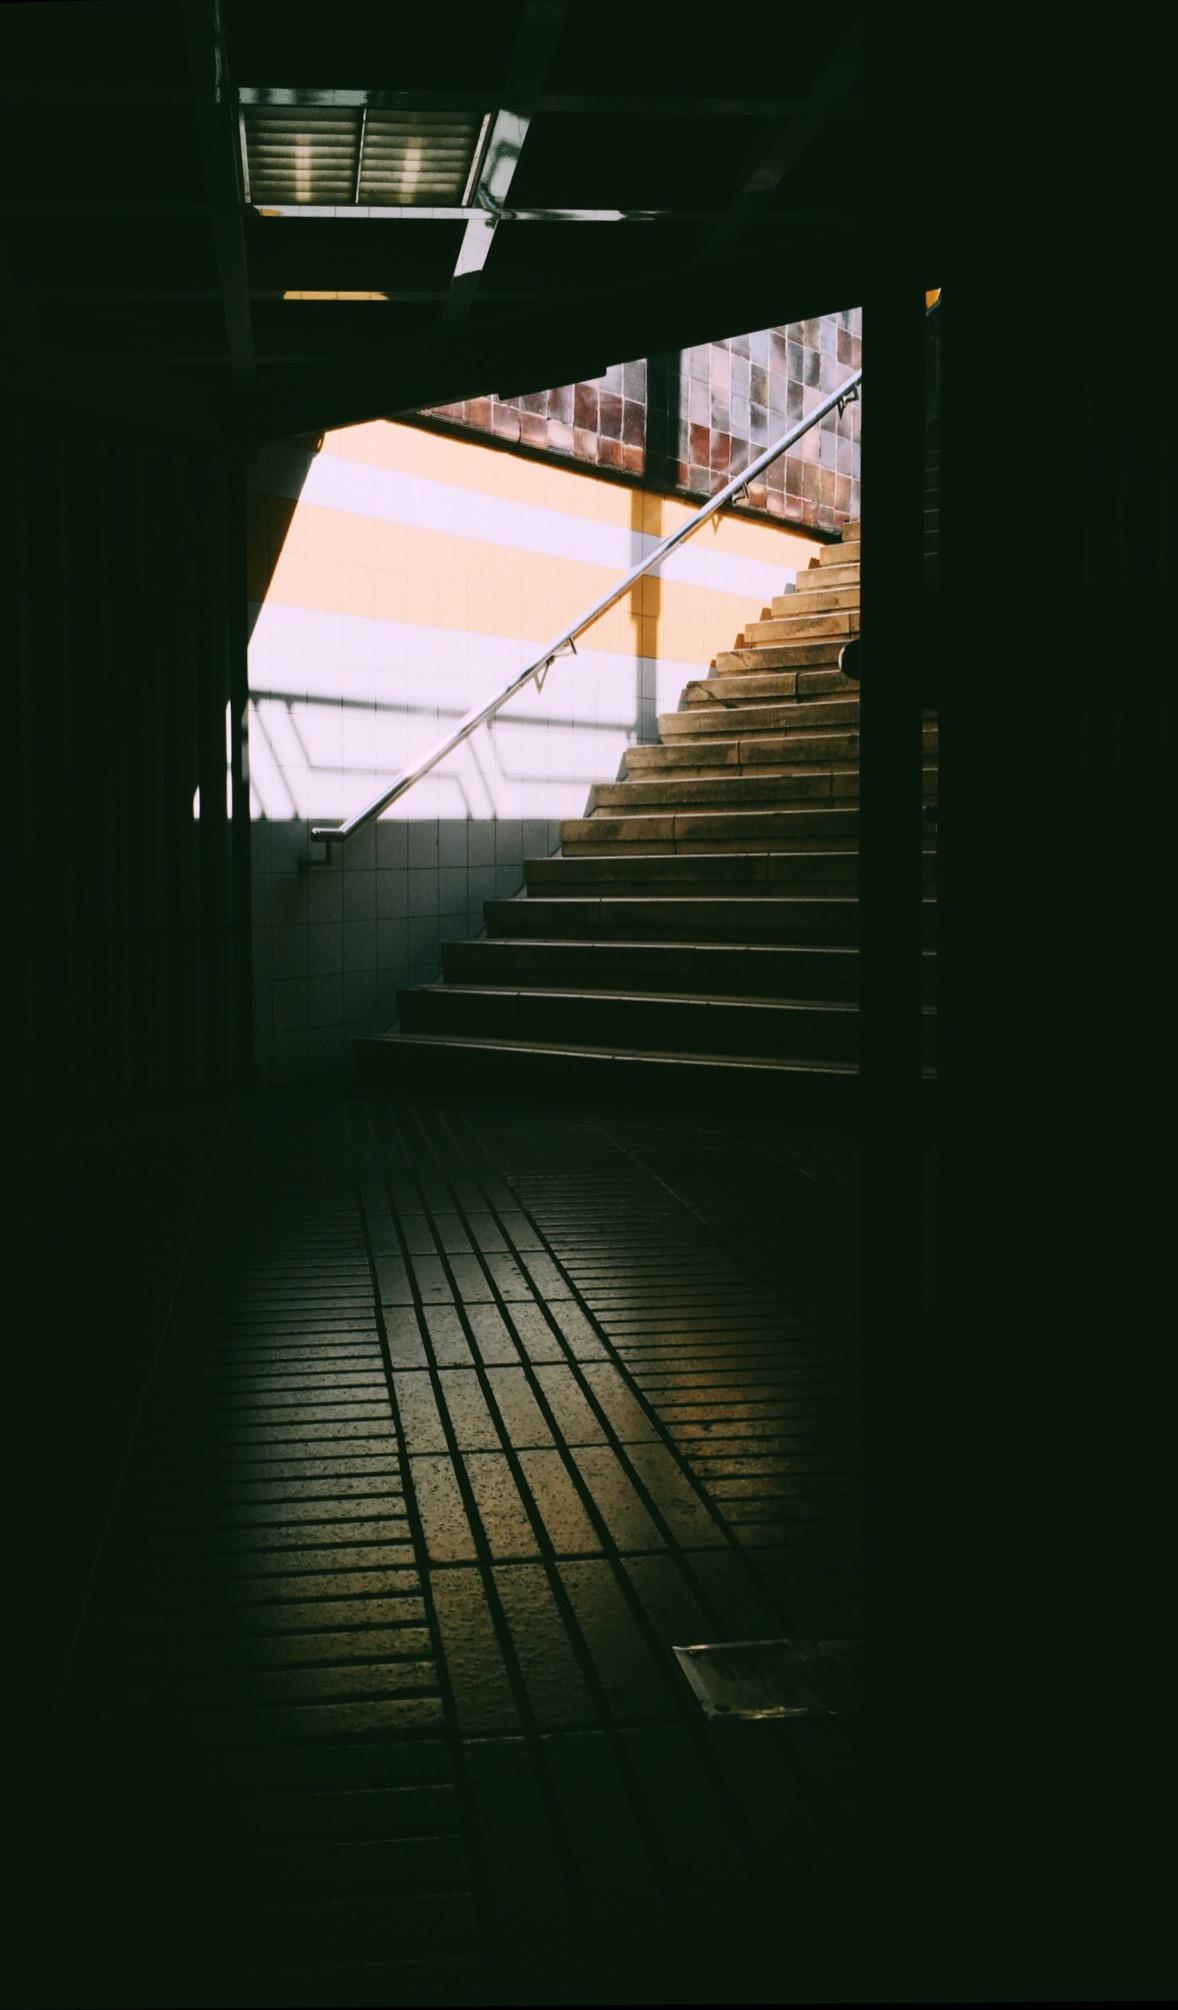 Foto 03.10.16, 13 09 16.jpg